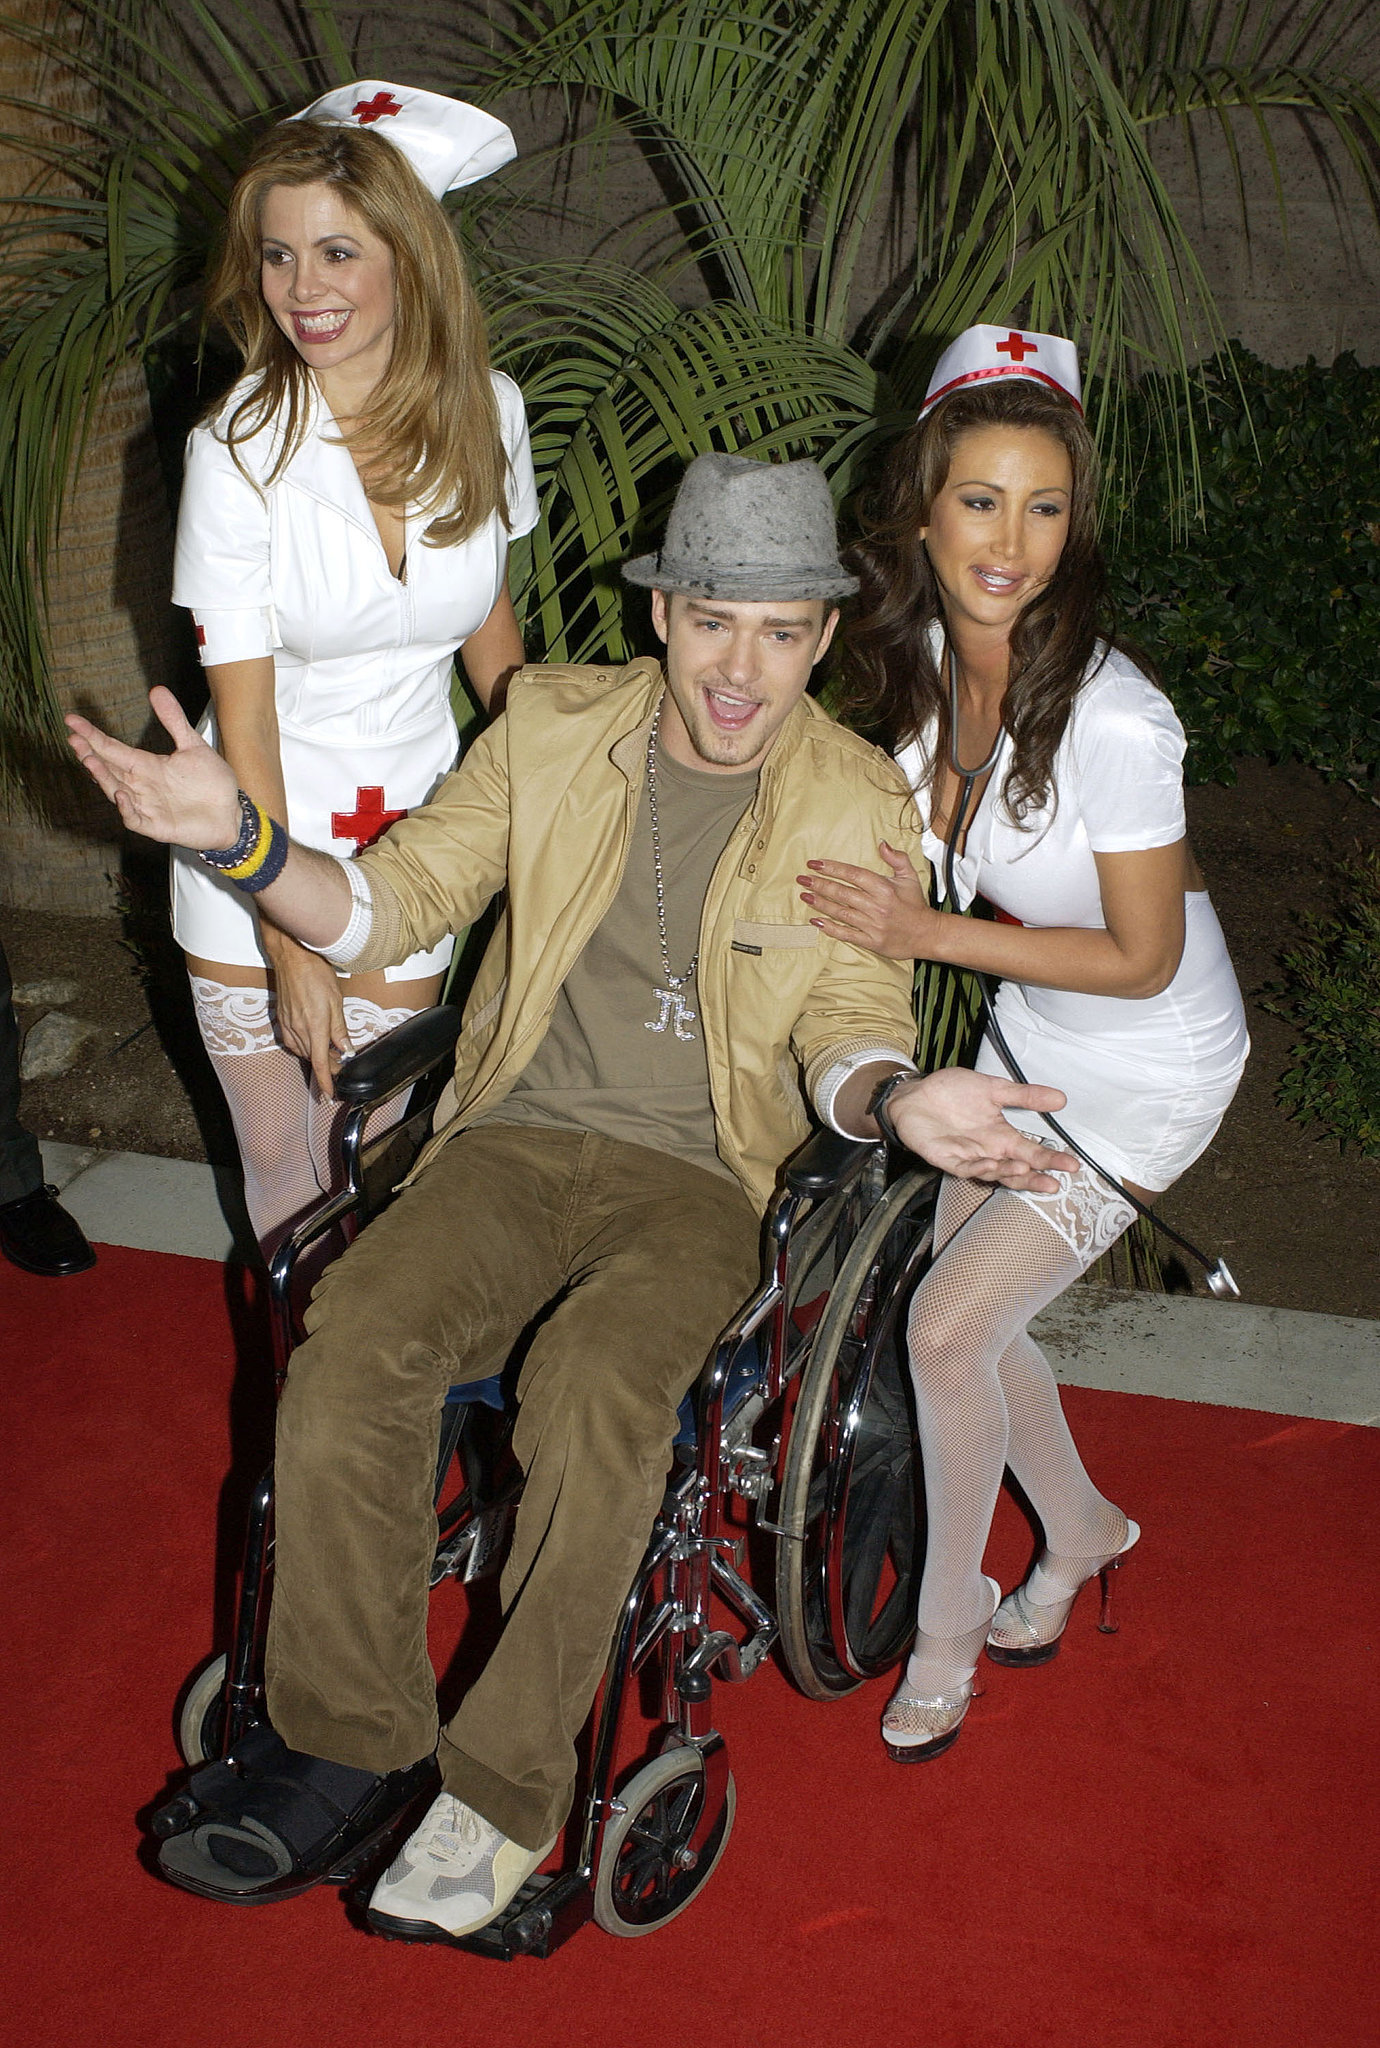 Justin Timberlake Literally Rolled Through the 2002 Awards